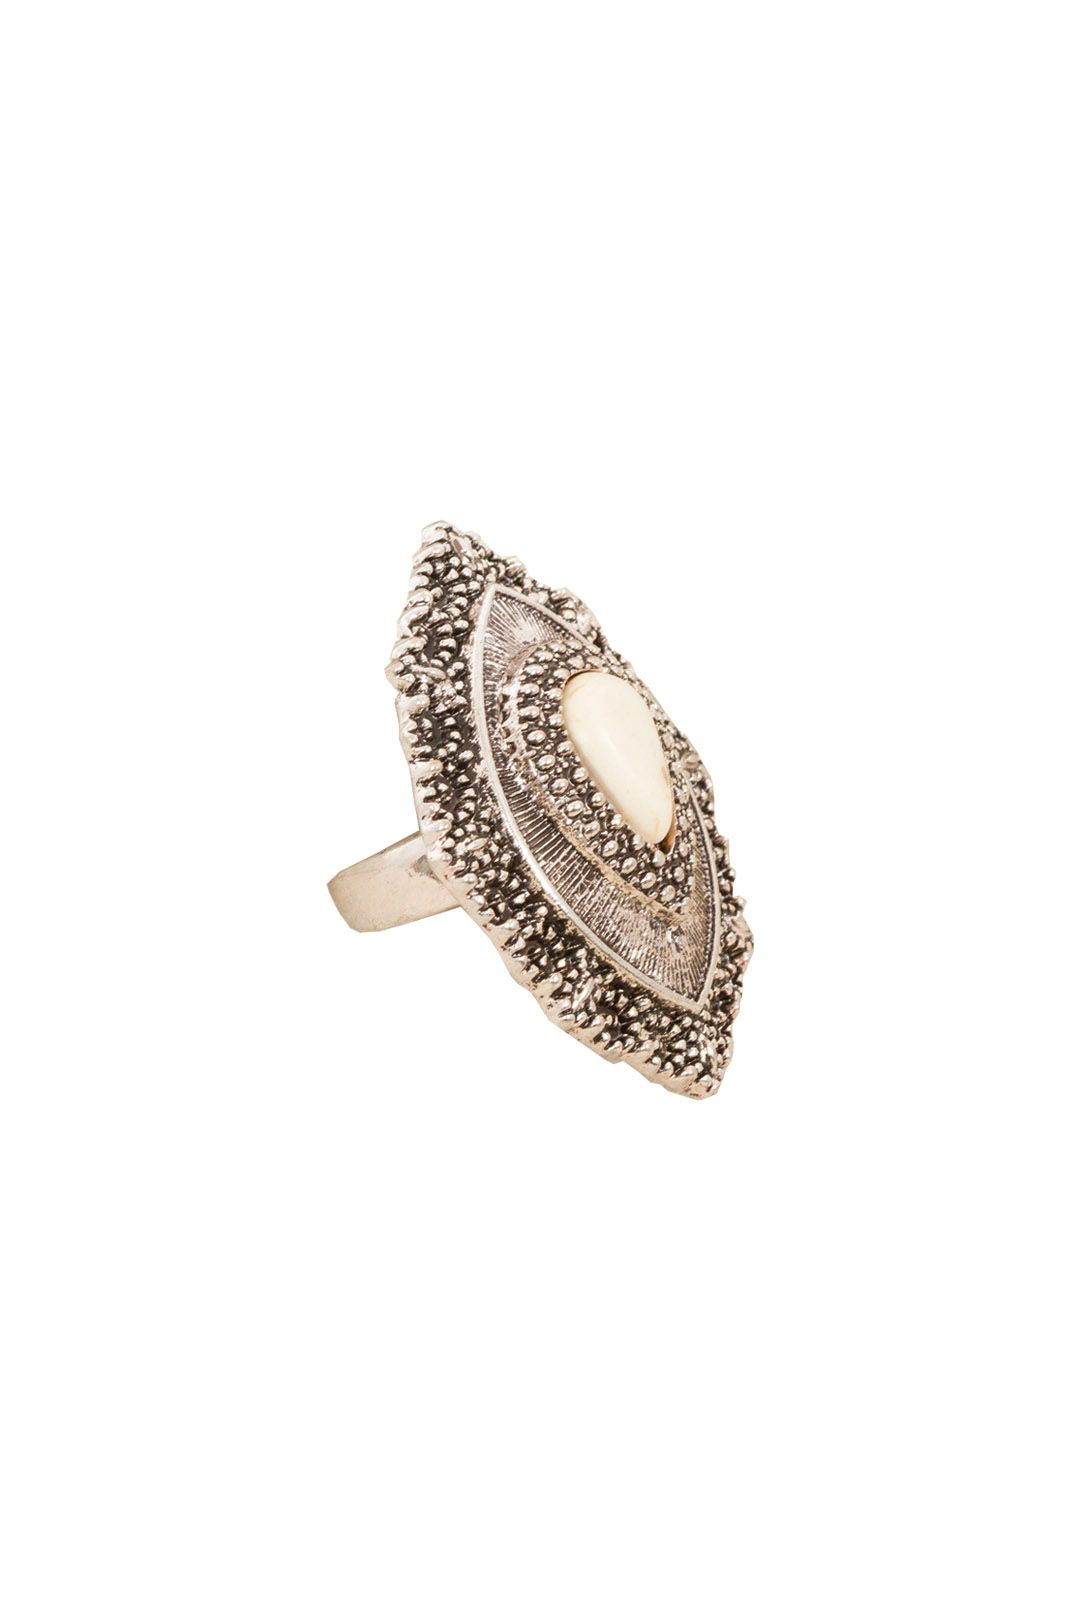 Adorne - Boho Stone Teardrop Ring - Natural Silver - Front